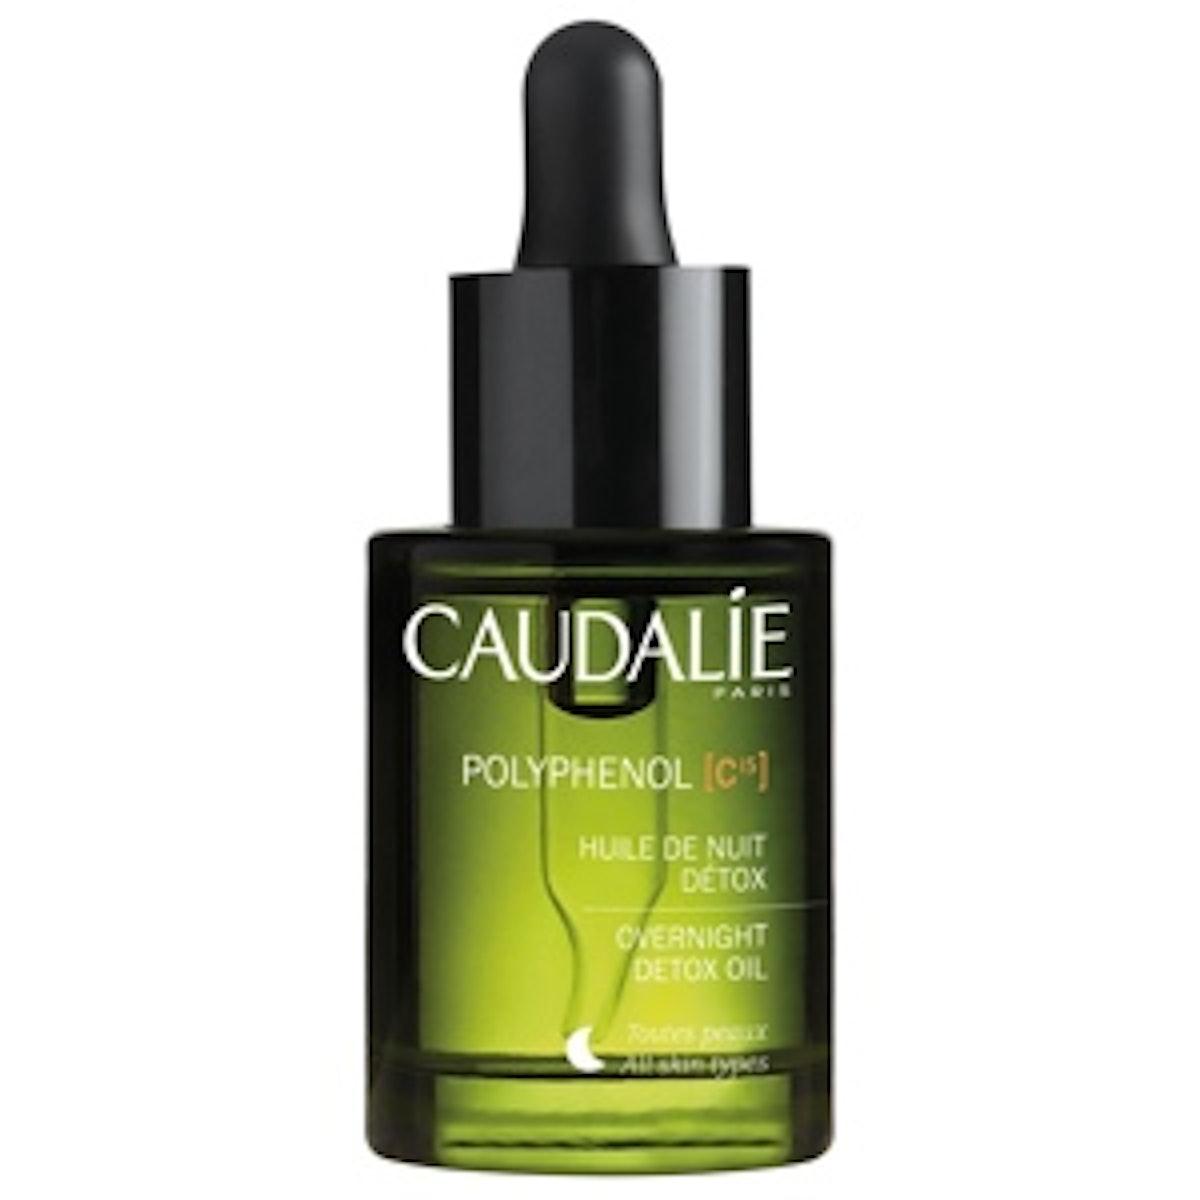 Polyphenol C15 Overnight Detox Oil